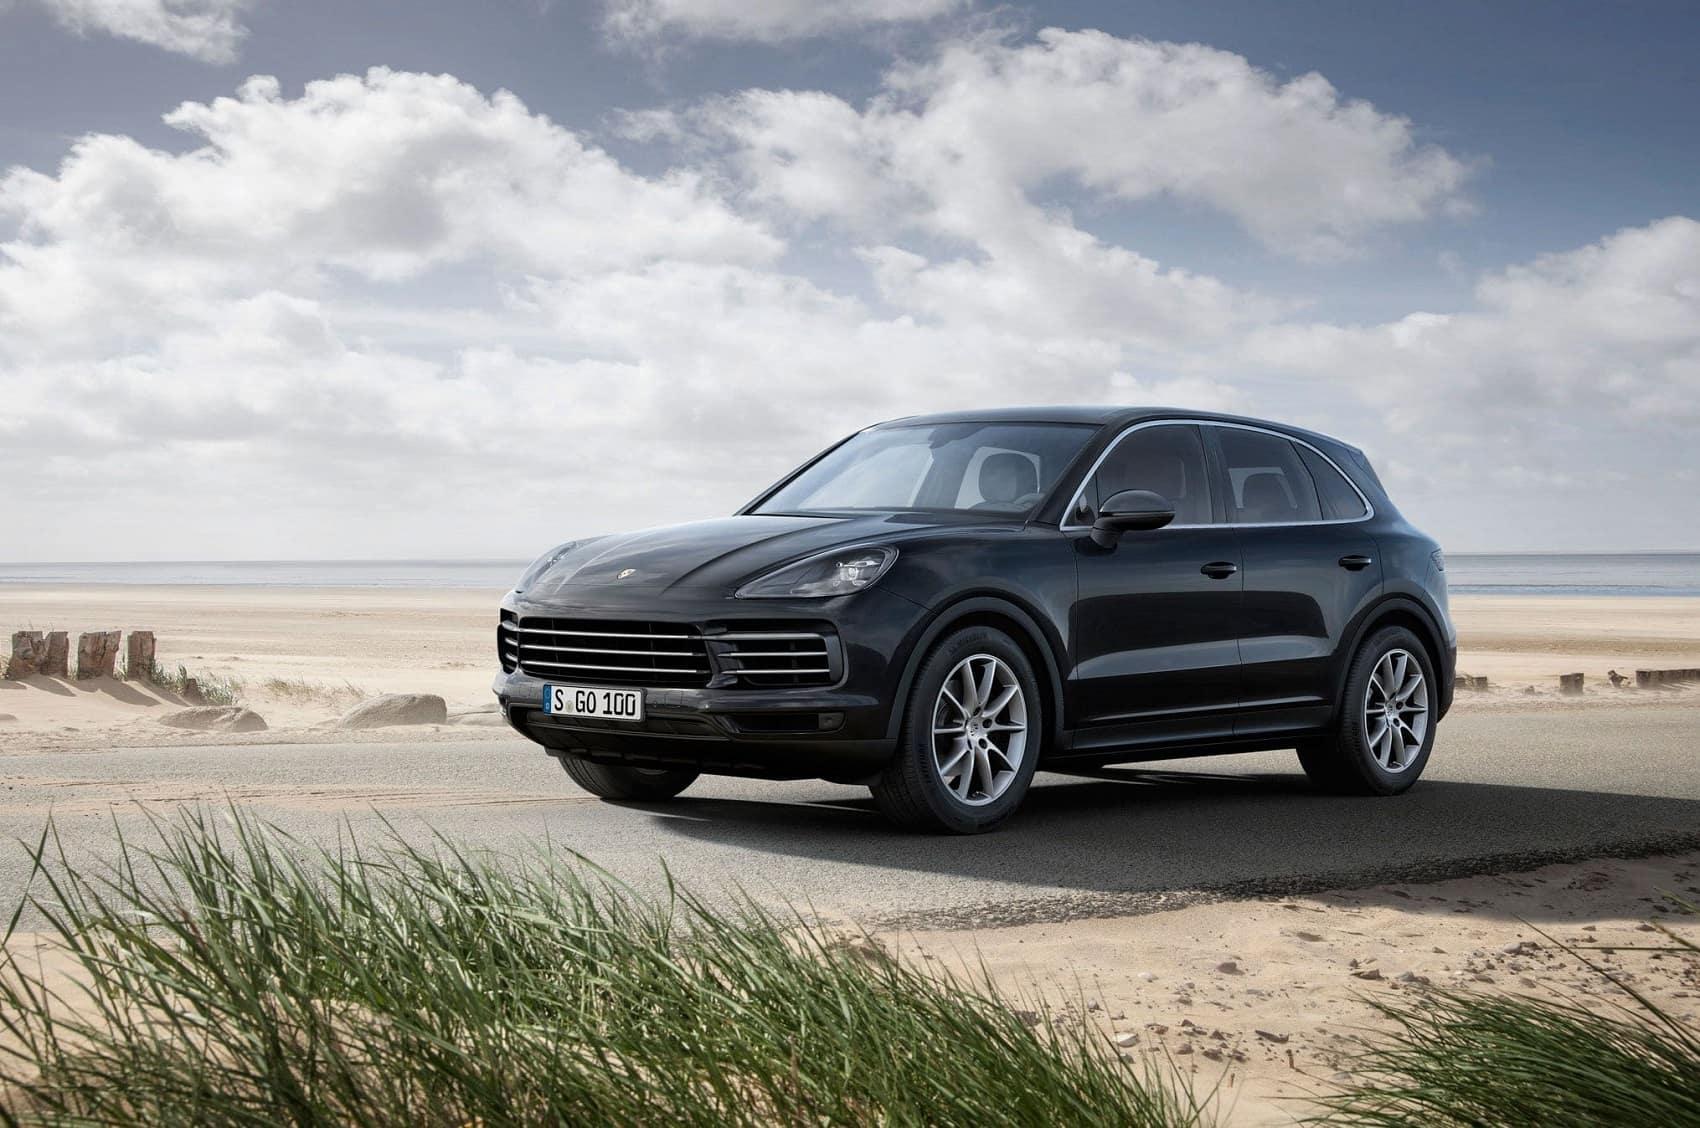 2019 Porsche Cayenne Exterior Front View